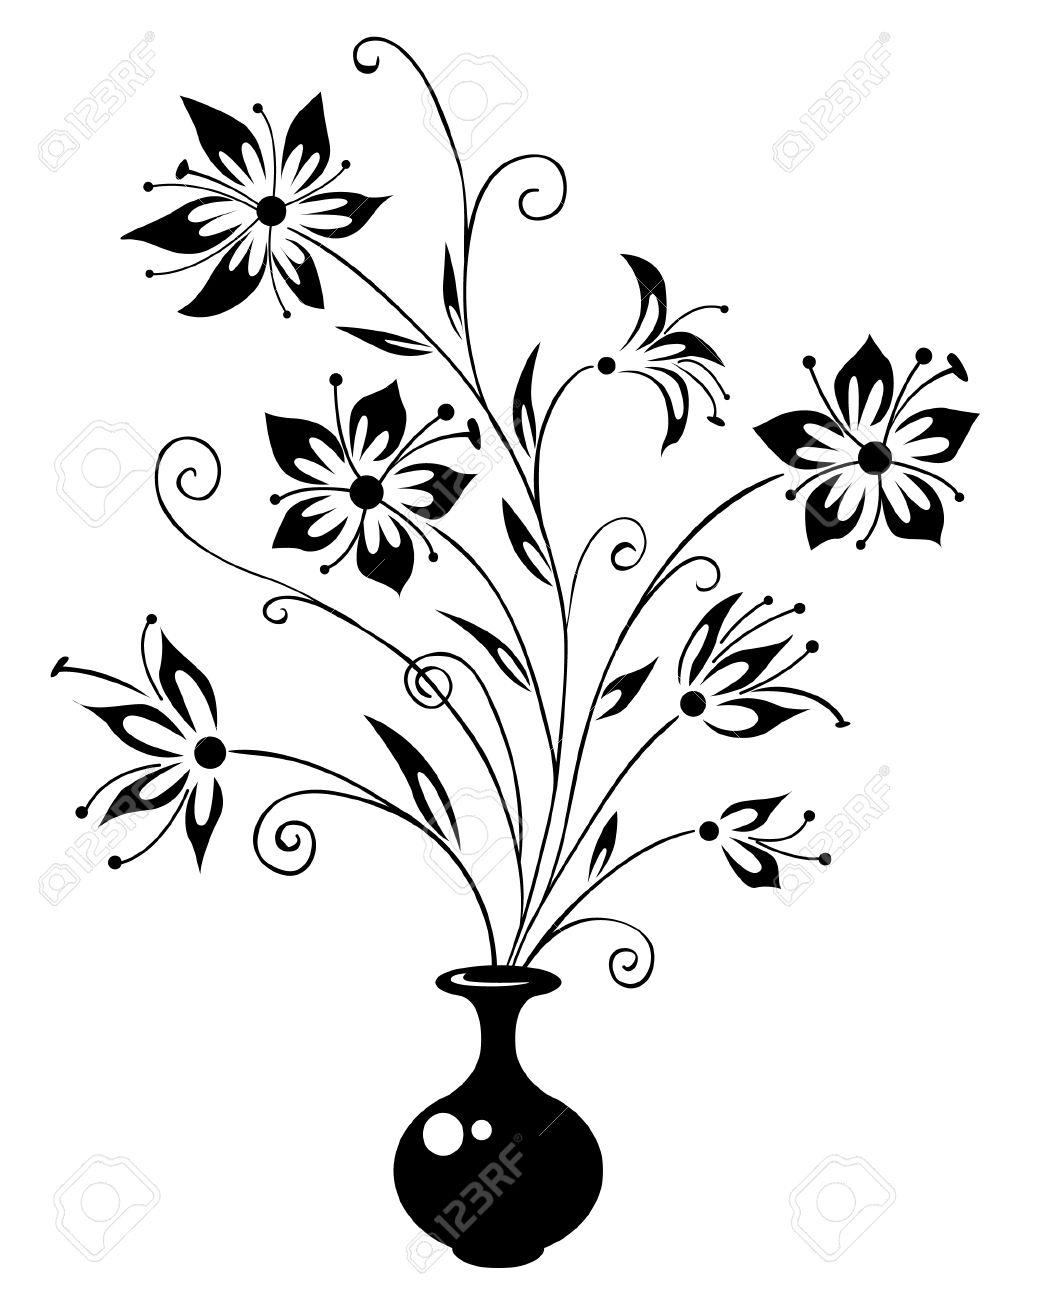 Drawn vase flower vase Flowers Sketch  Vase Flower